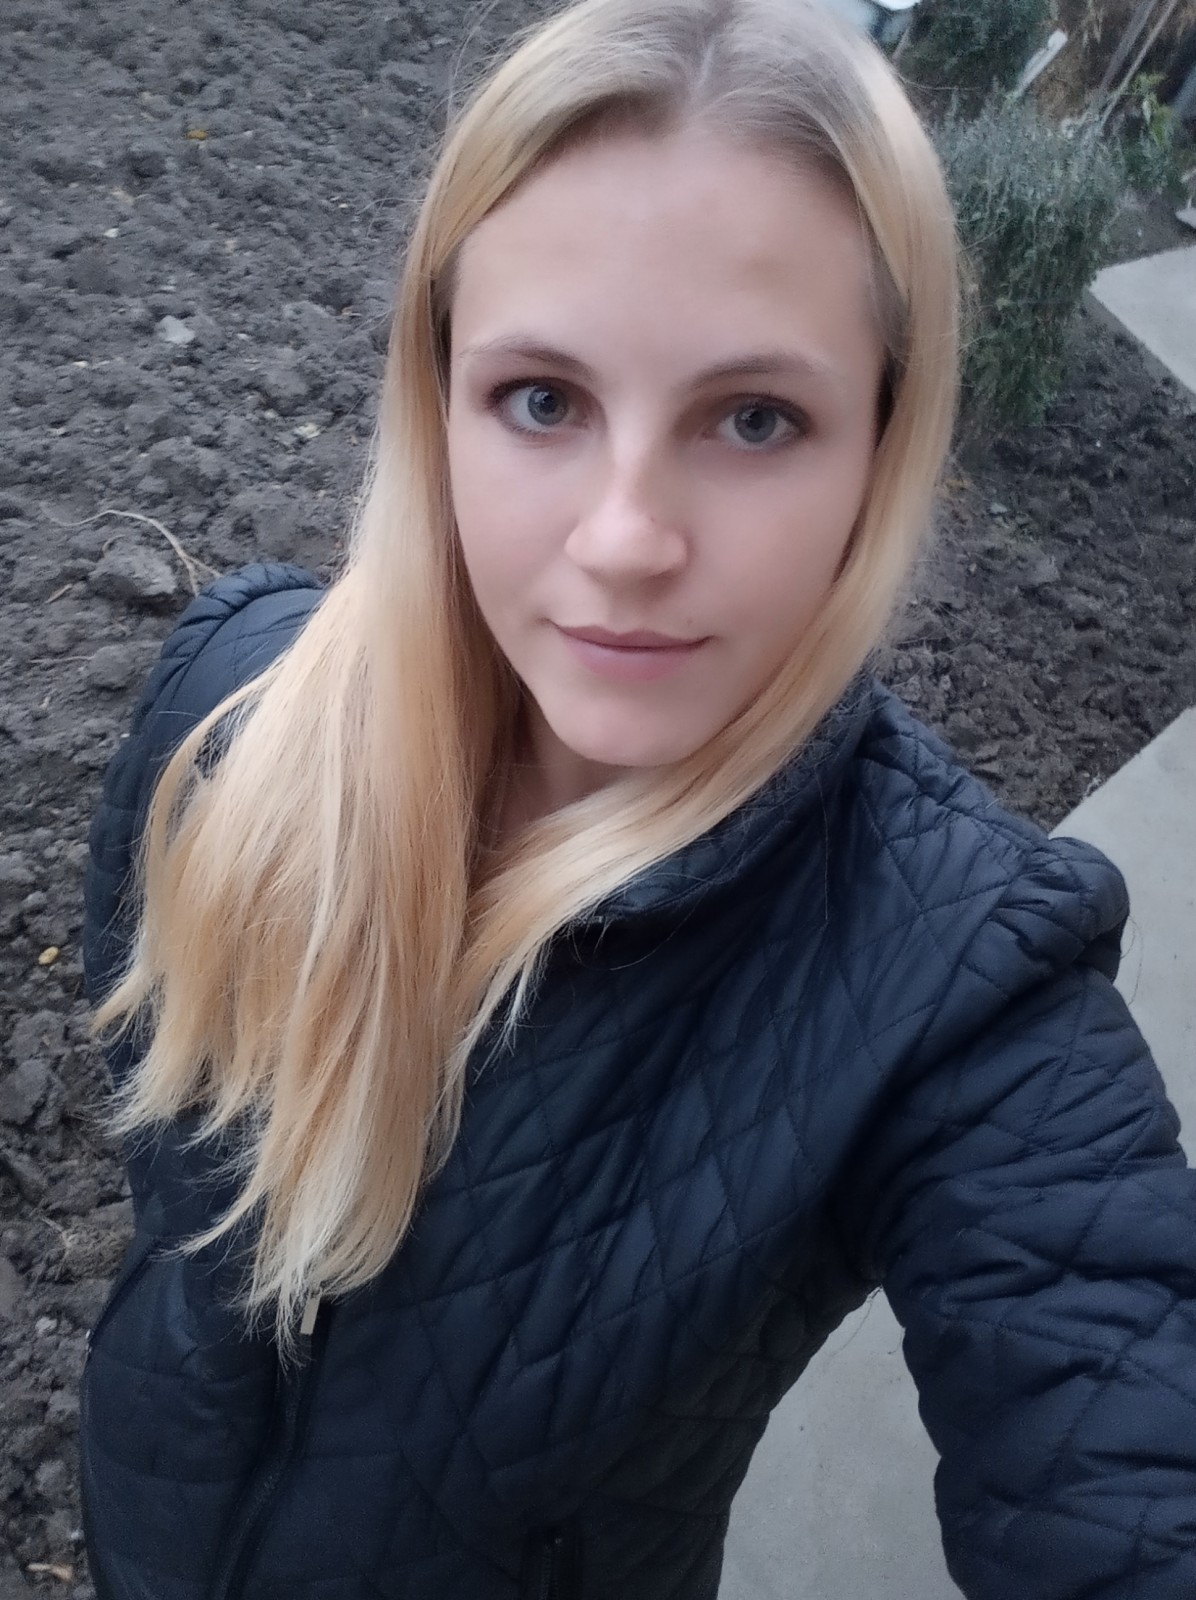 o singura femeie cauta)